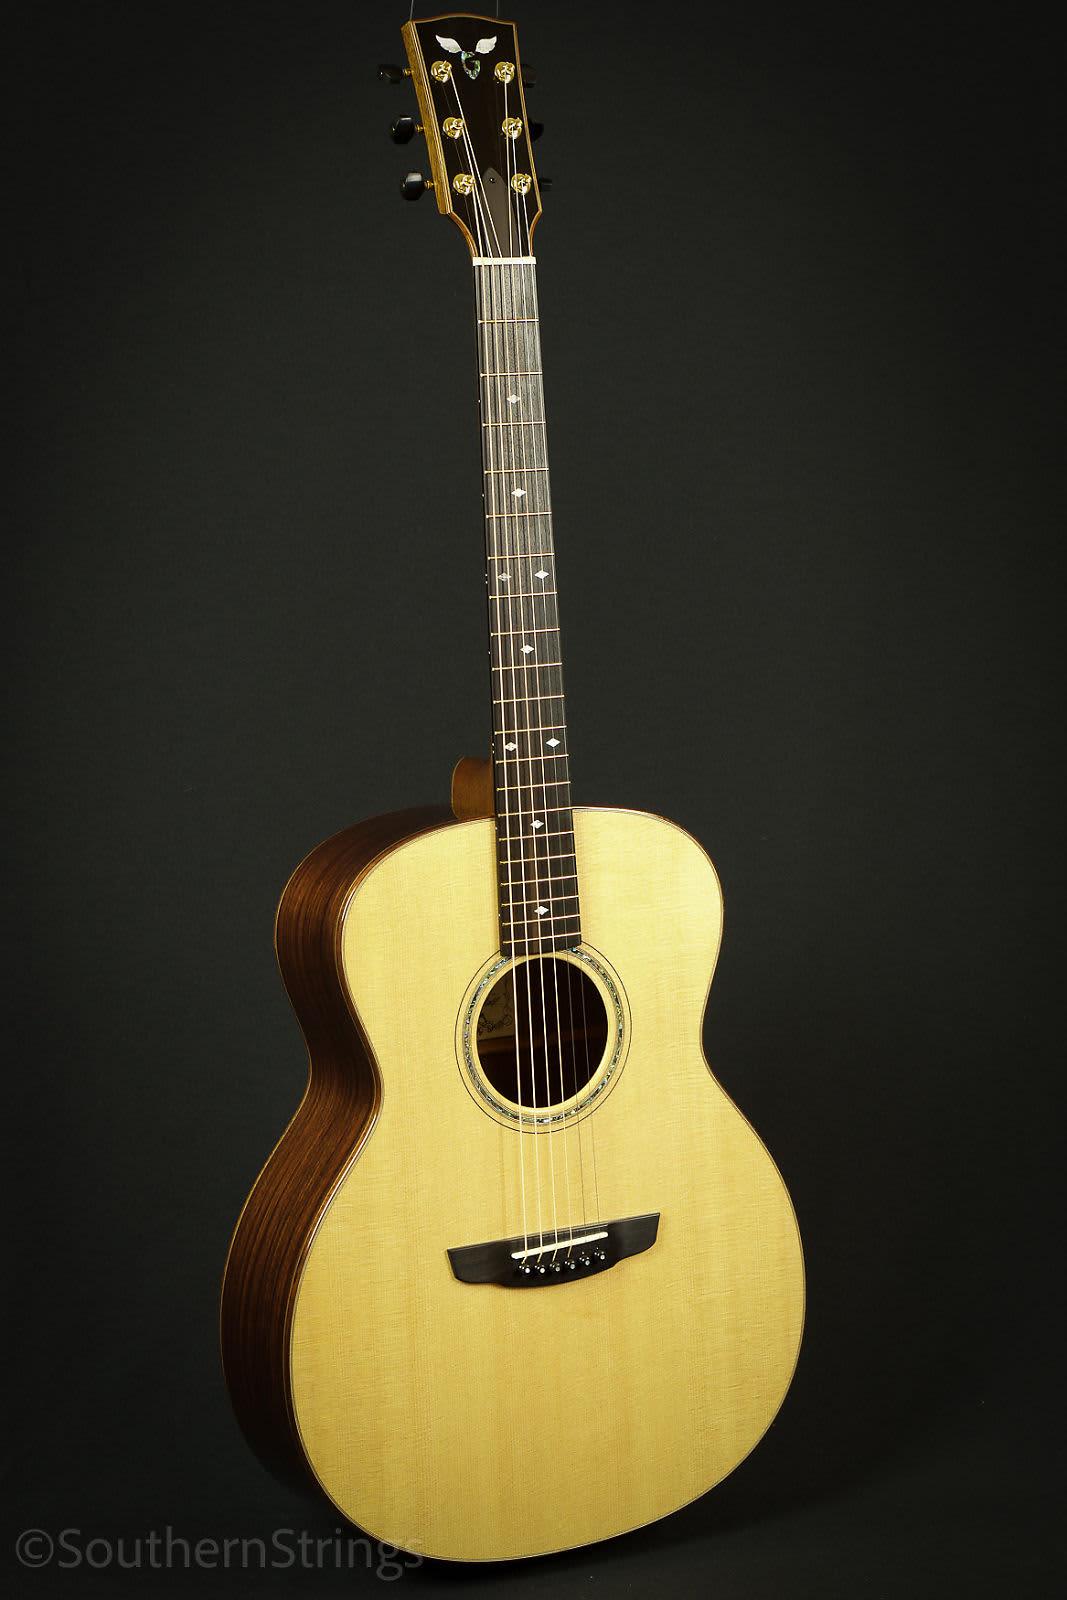 Goodall Concert Jumbo Southern Strings Reverb